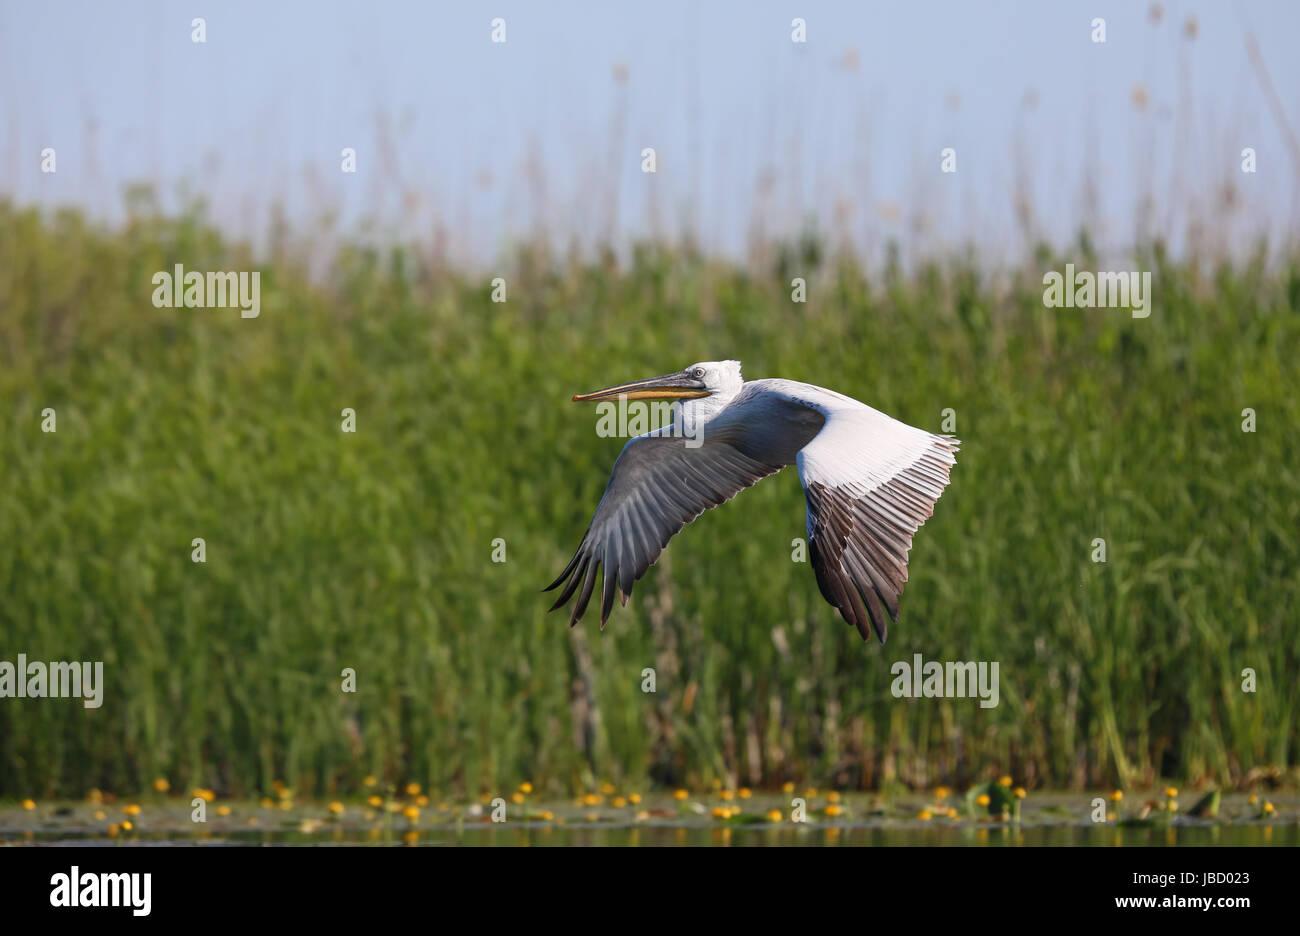 Dalmatian pelican (Pelecanus crispus) in flight over the Danube River Delta in Romania - Stock Image